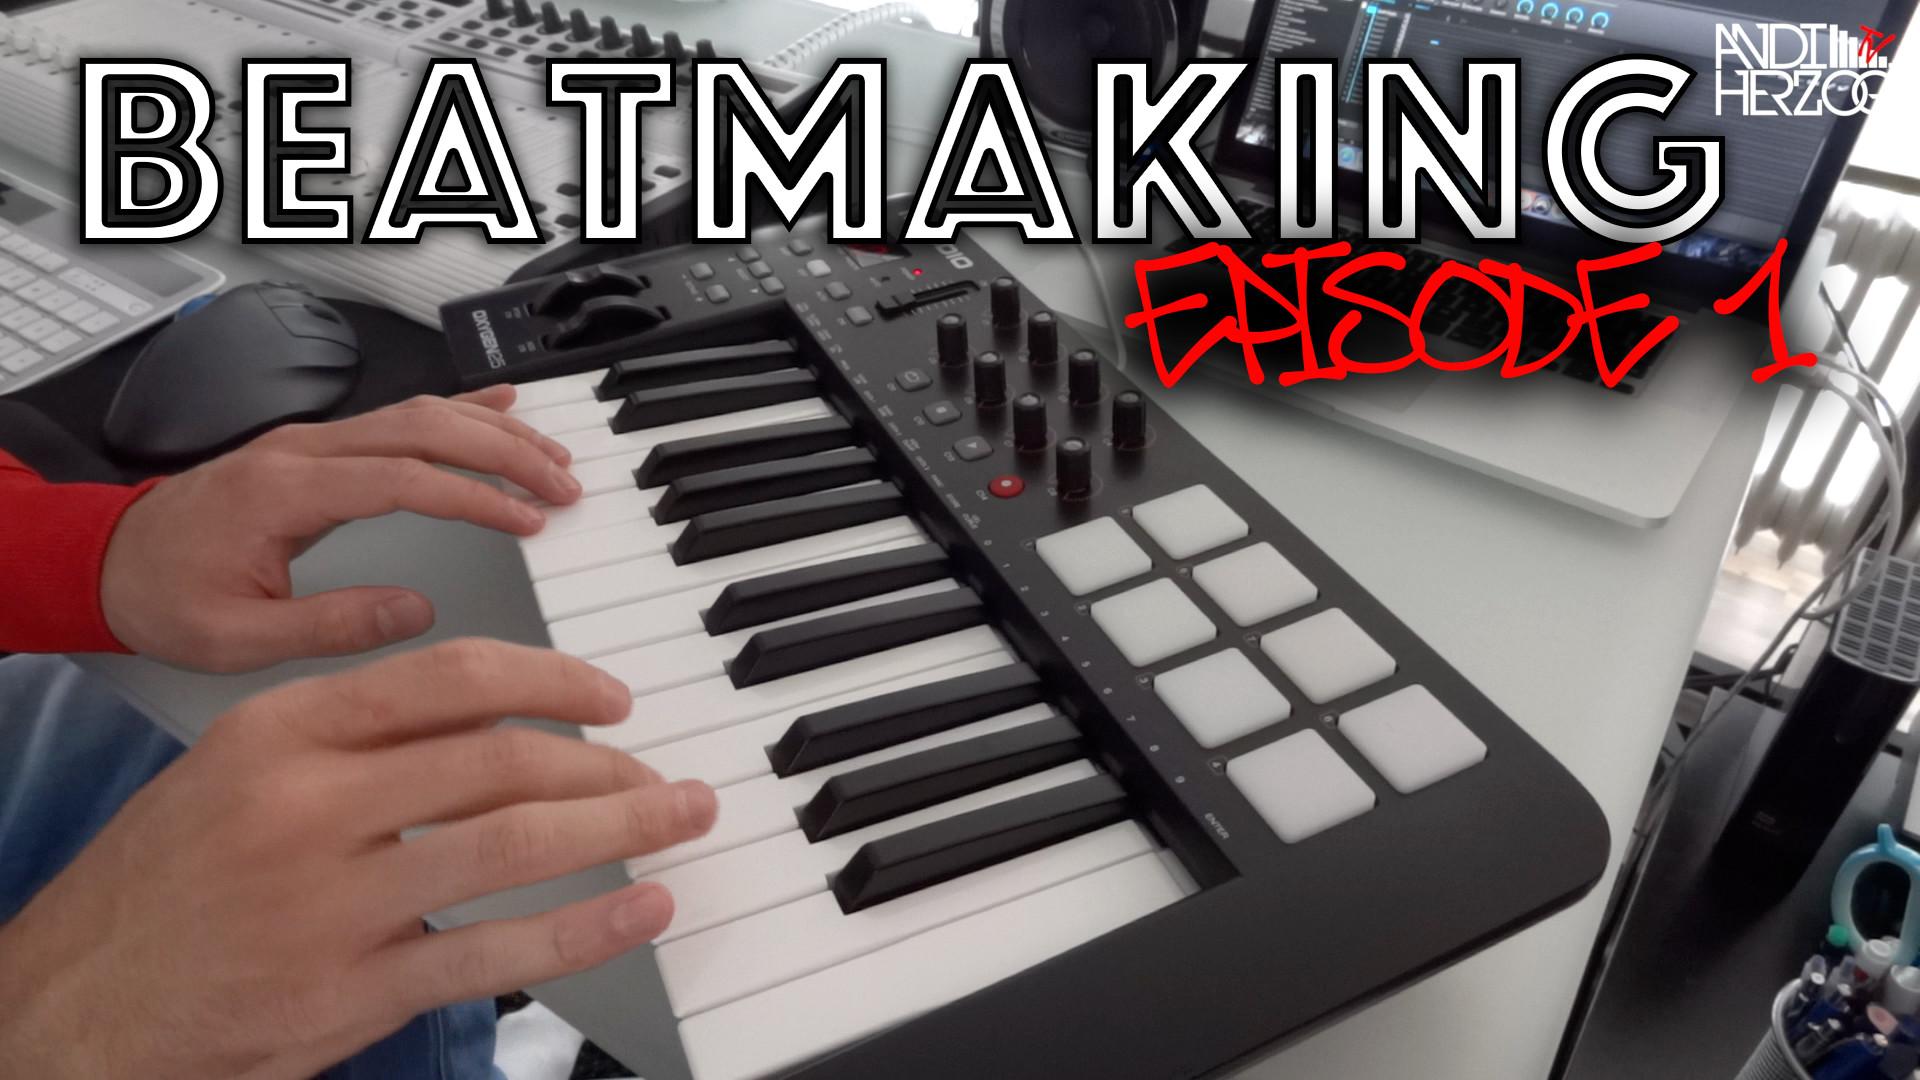 Beatmaking Episode 1 - Titelbild